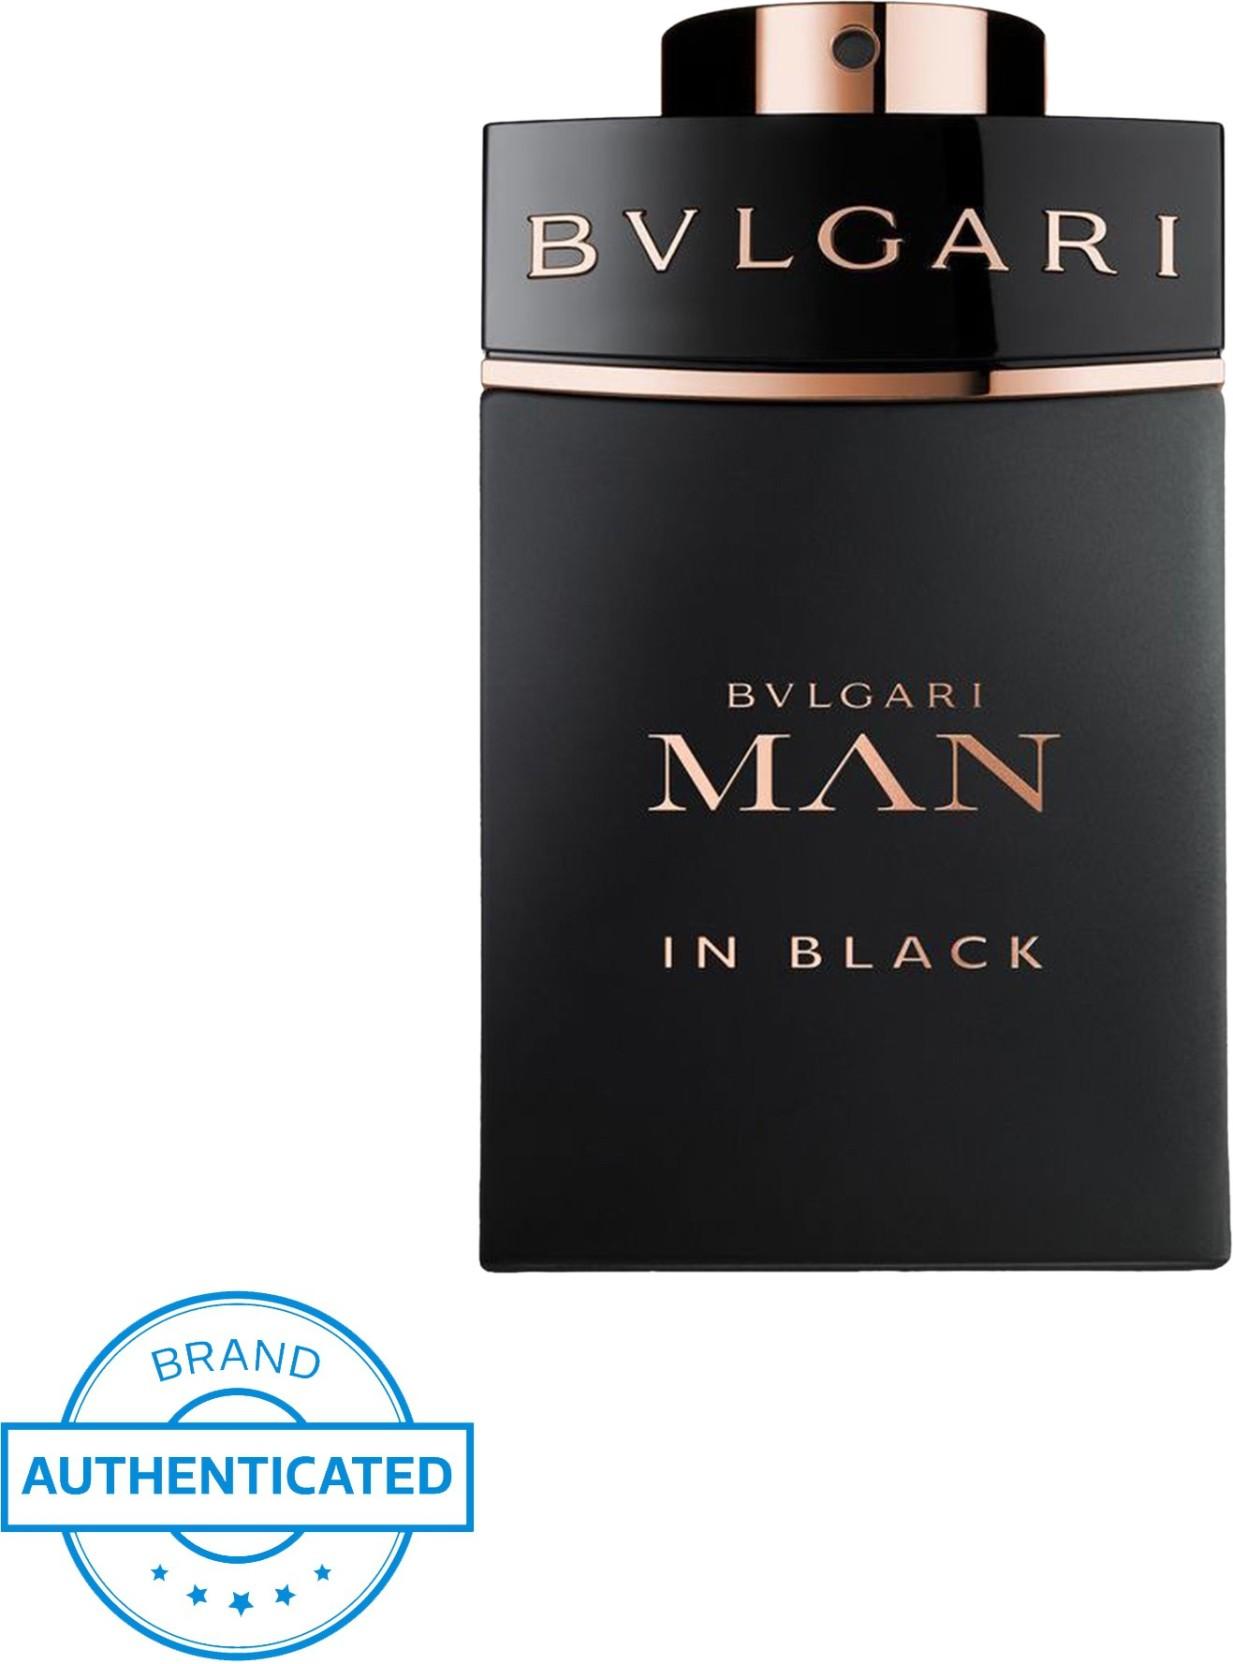 Buy Bvlgari Man In Black Eau De Parfum 60 Ml Online India Original Adidas Get Ready Add To Cart